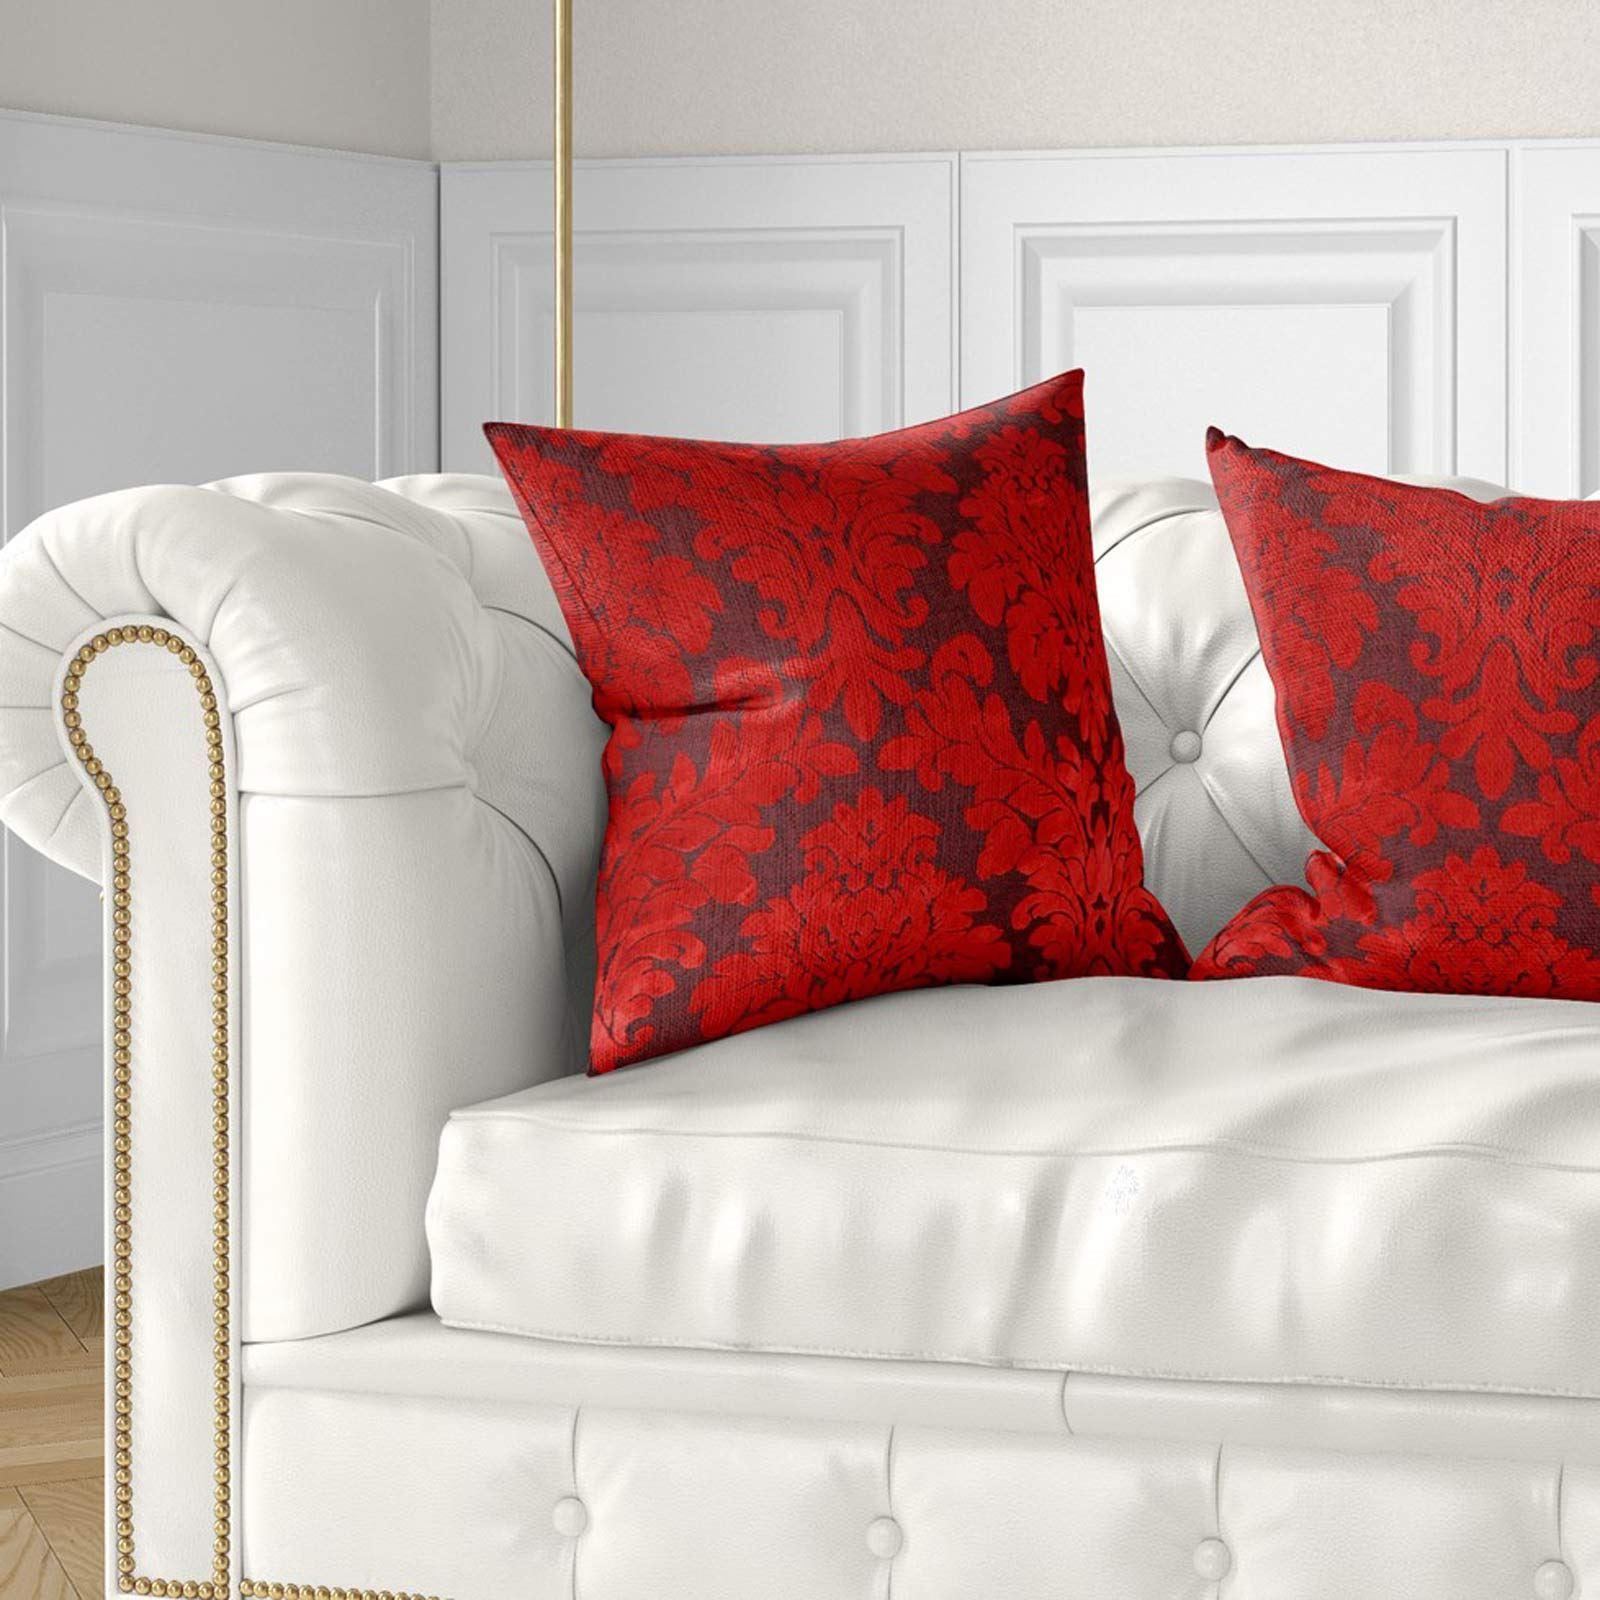 Vino-Tinto-Cushion-Covers-Coleccion-17-034-18-034-43cm-45cm-Cubierta miniatura 18